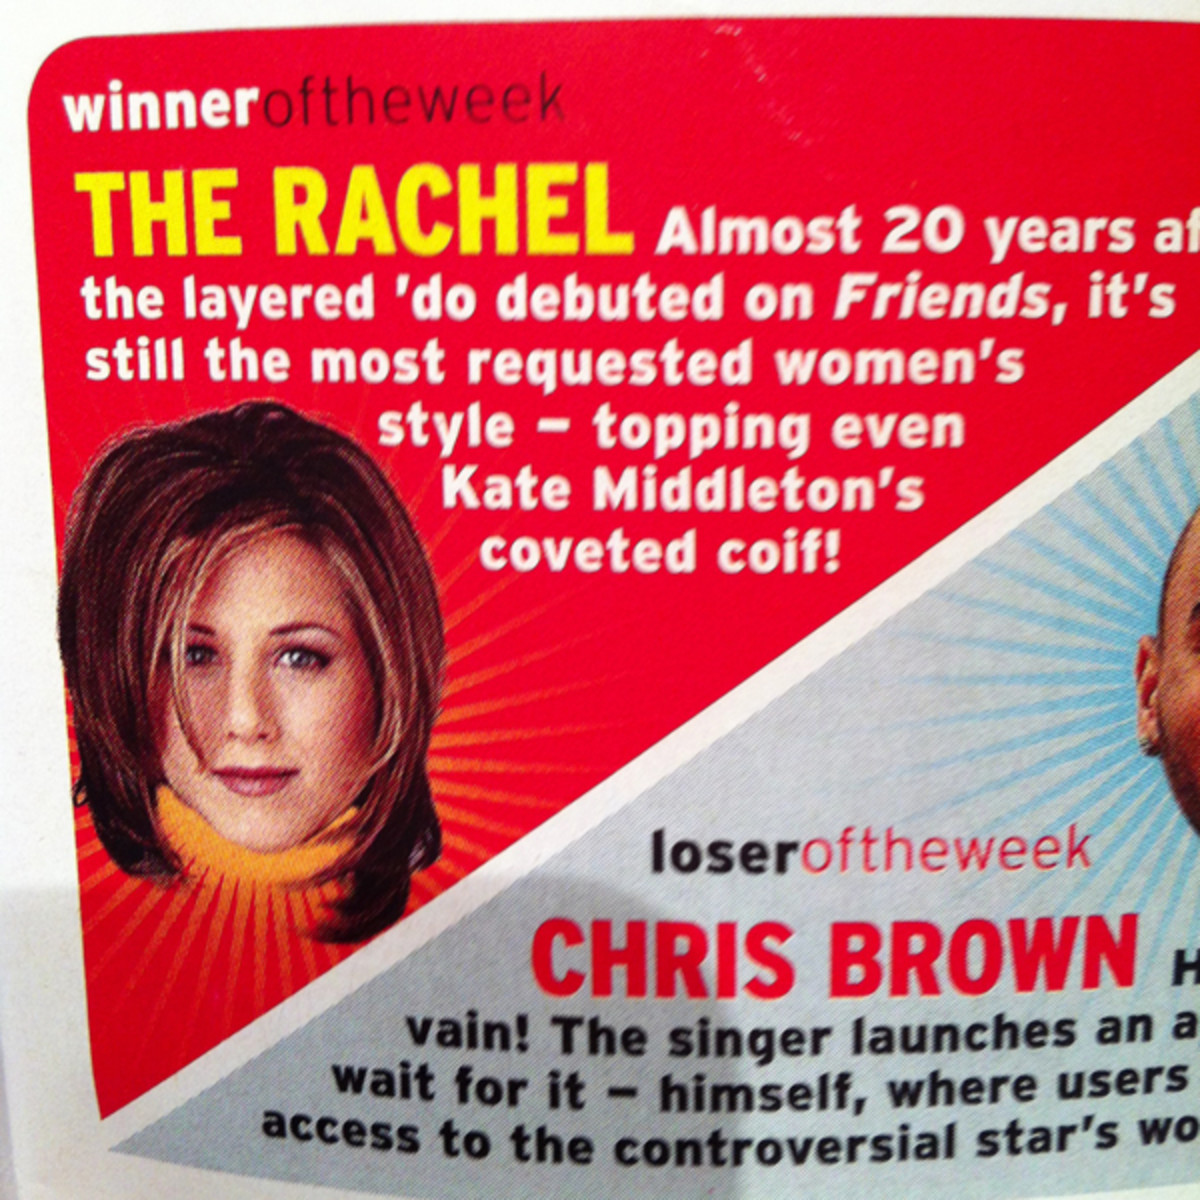 The Rachel cut